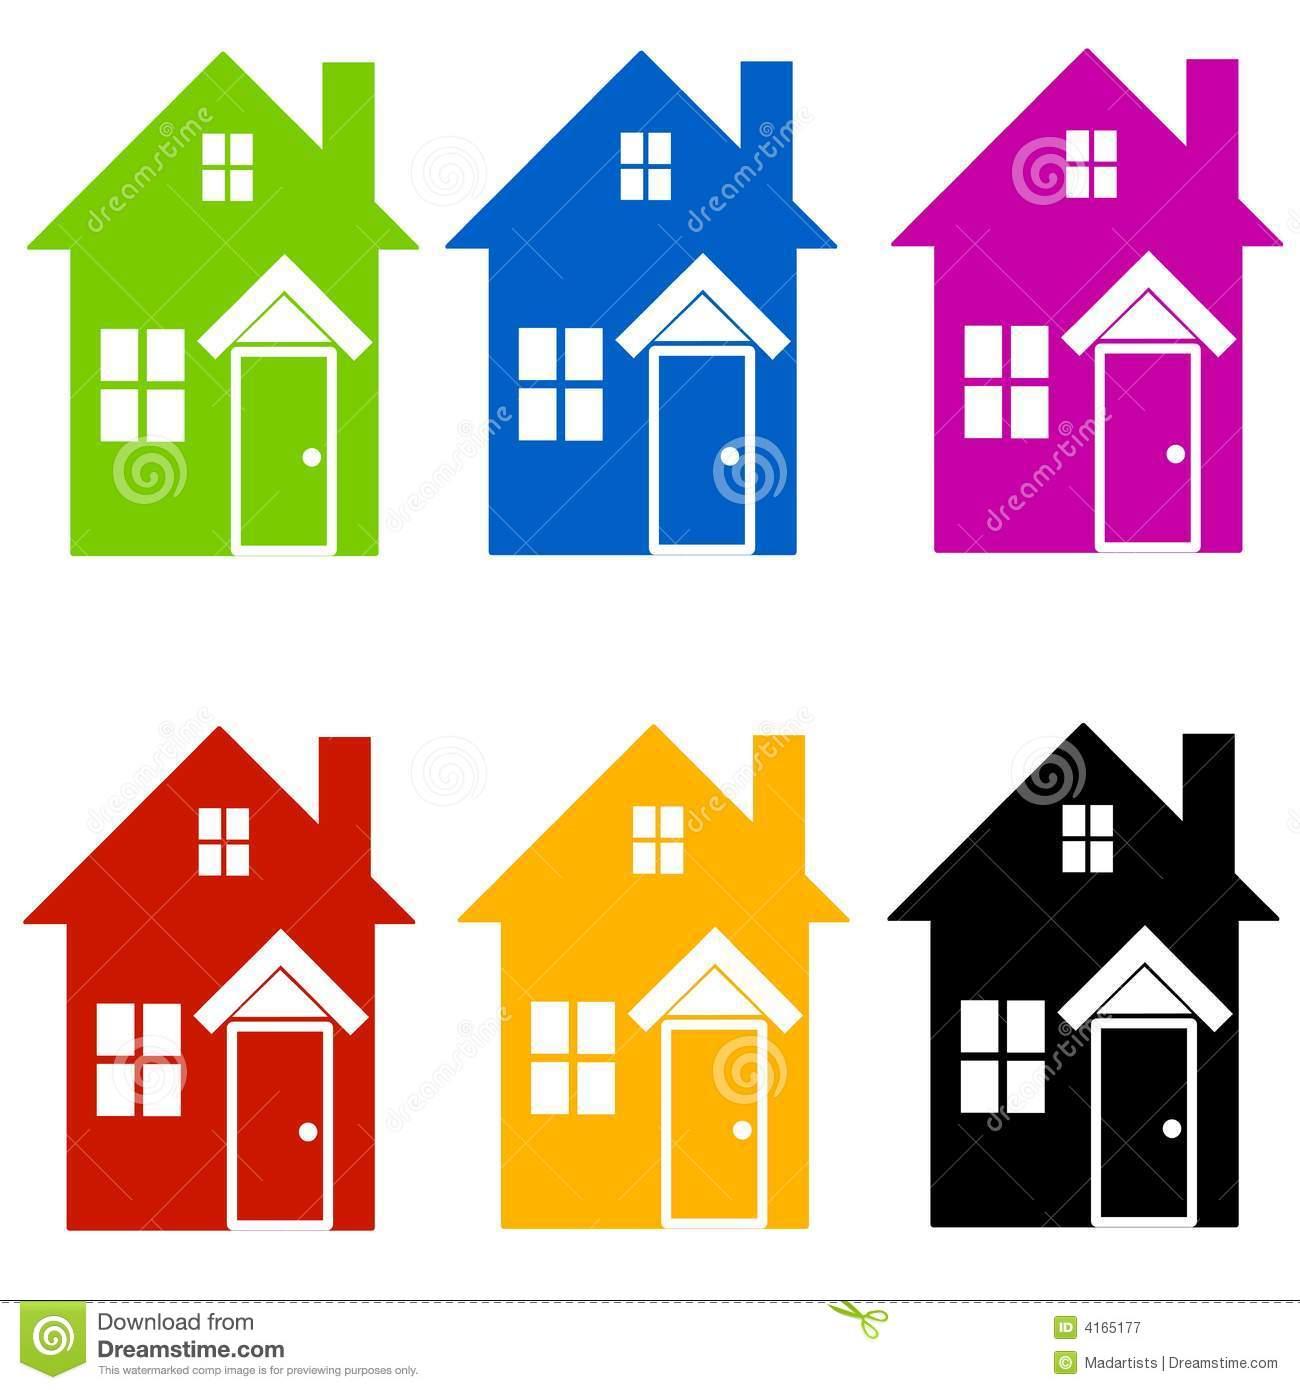 1300x1390 House Silhouette Clip Art Victorian House Outline Clip Art House